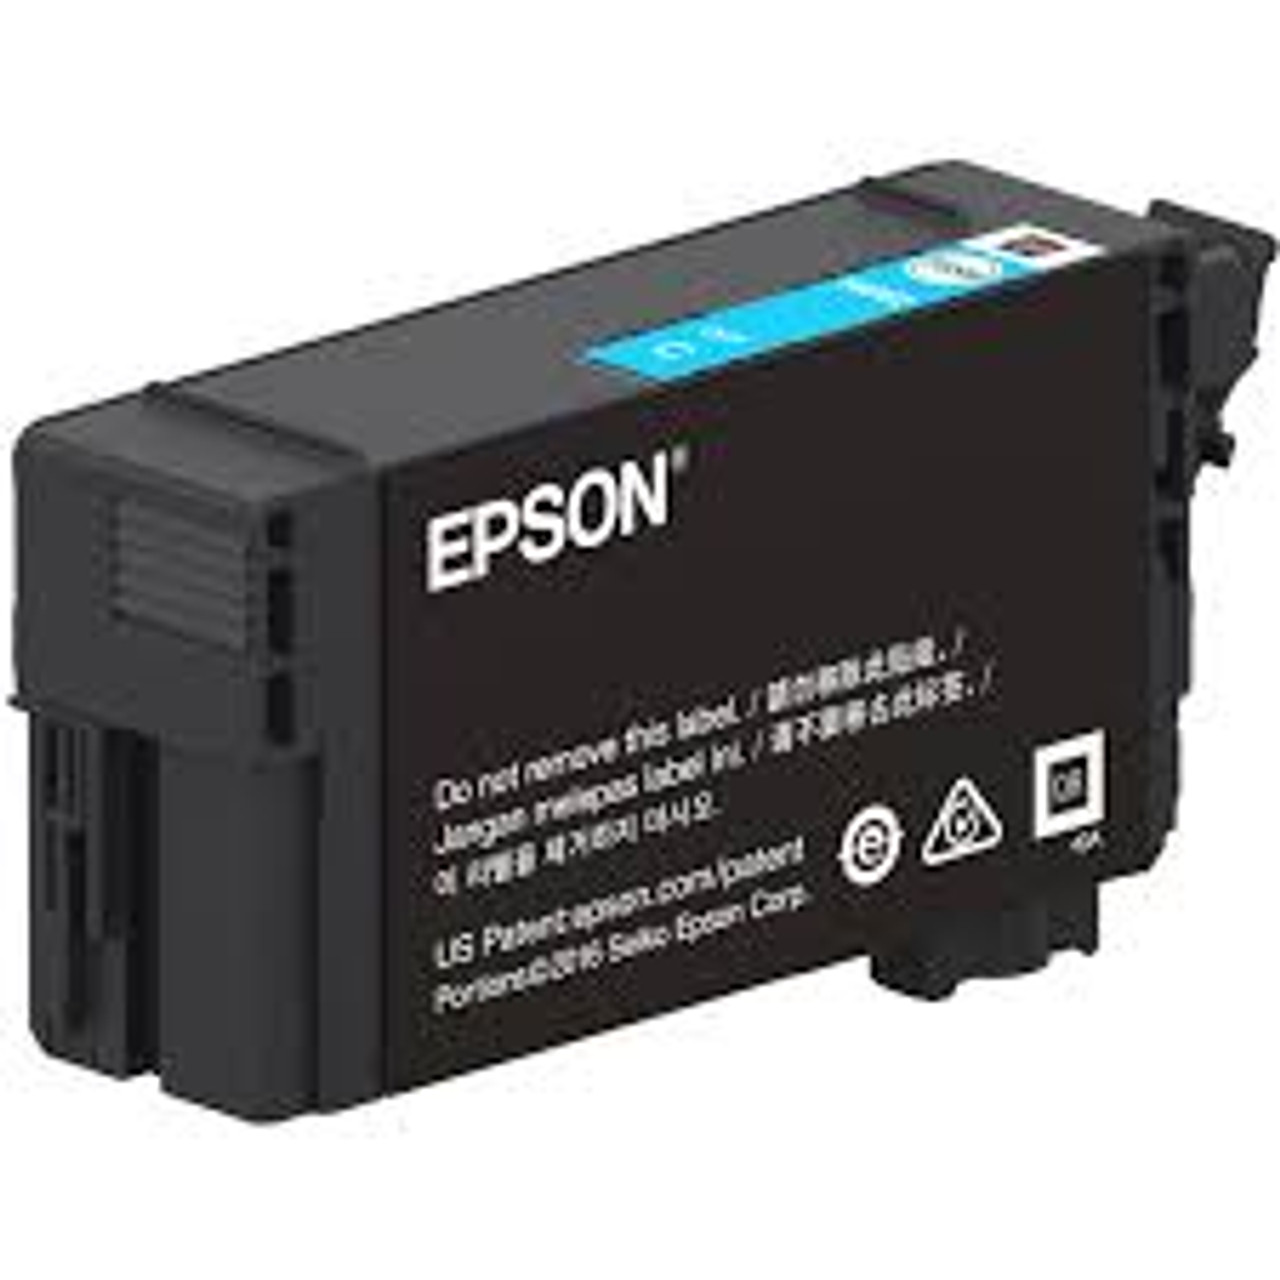 Epson UltraChrome XD2 T40W Yellow High-Capacity Ink Cartridge 50ml